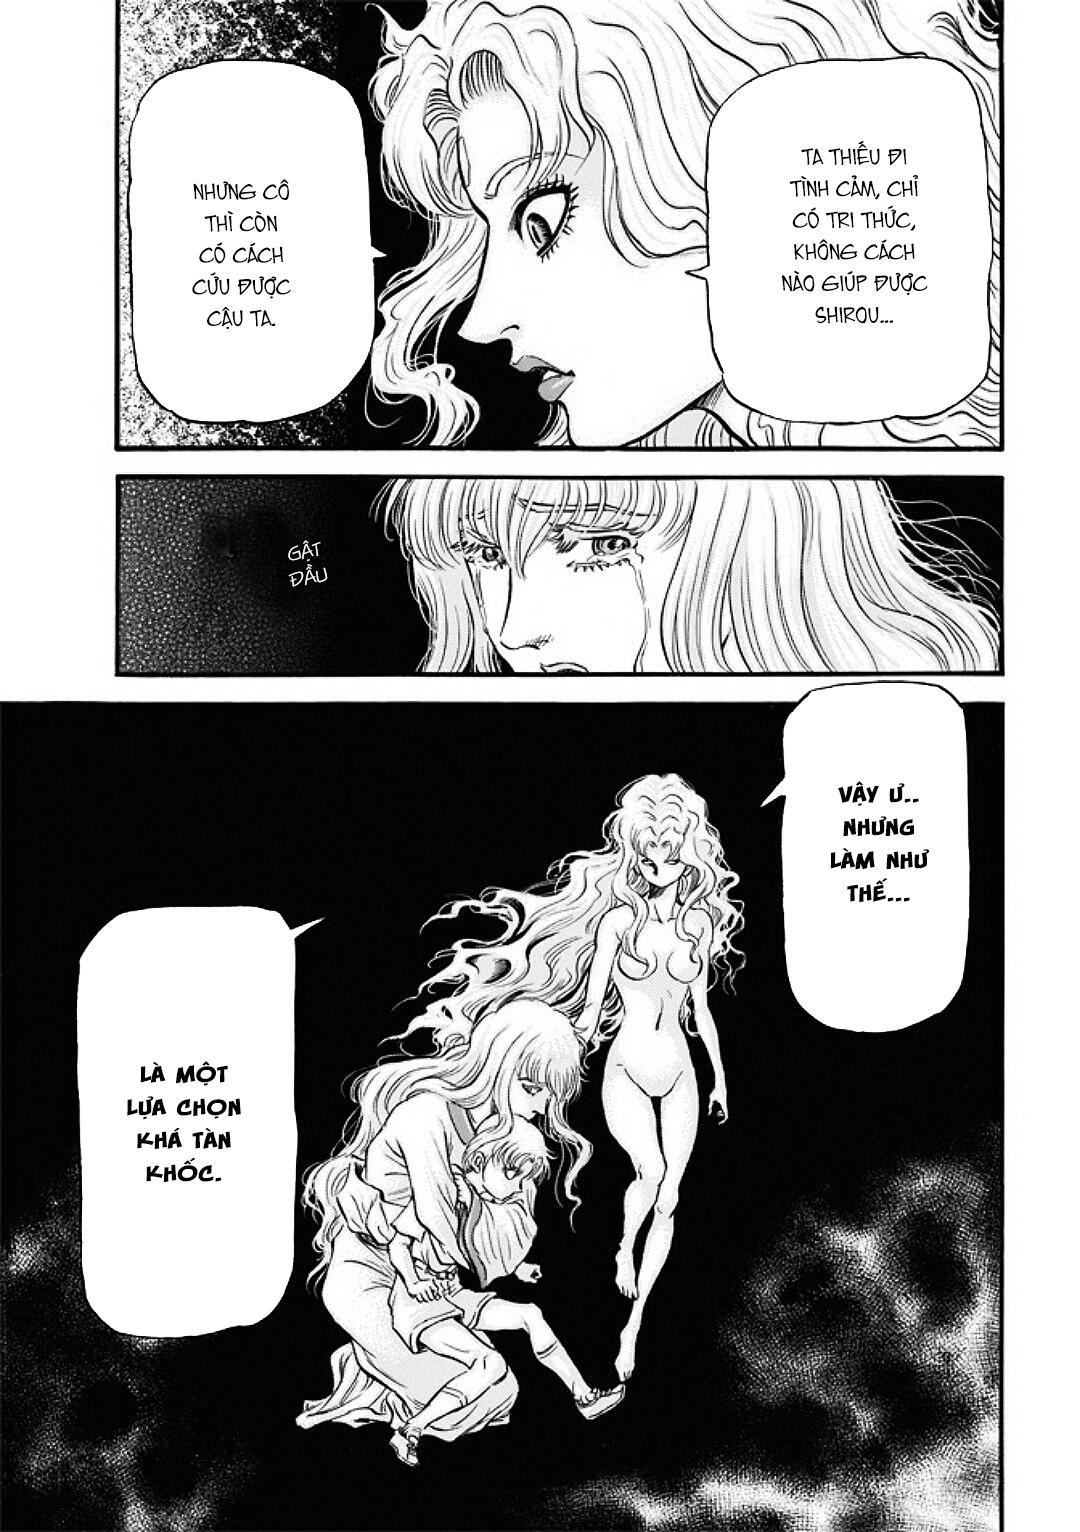 Ryuuroden - Chú bé rồng Chapter 287 - Hamtruyen.vn